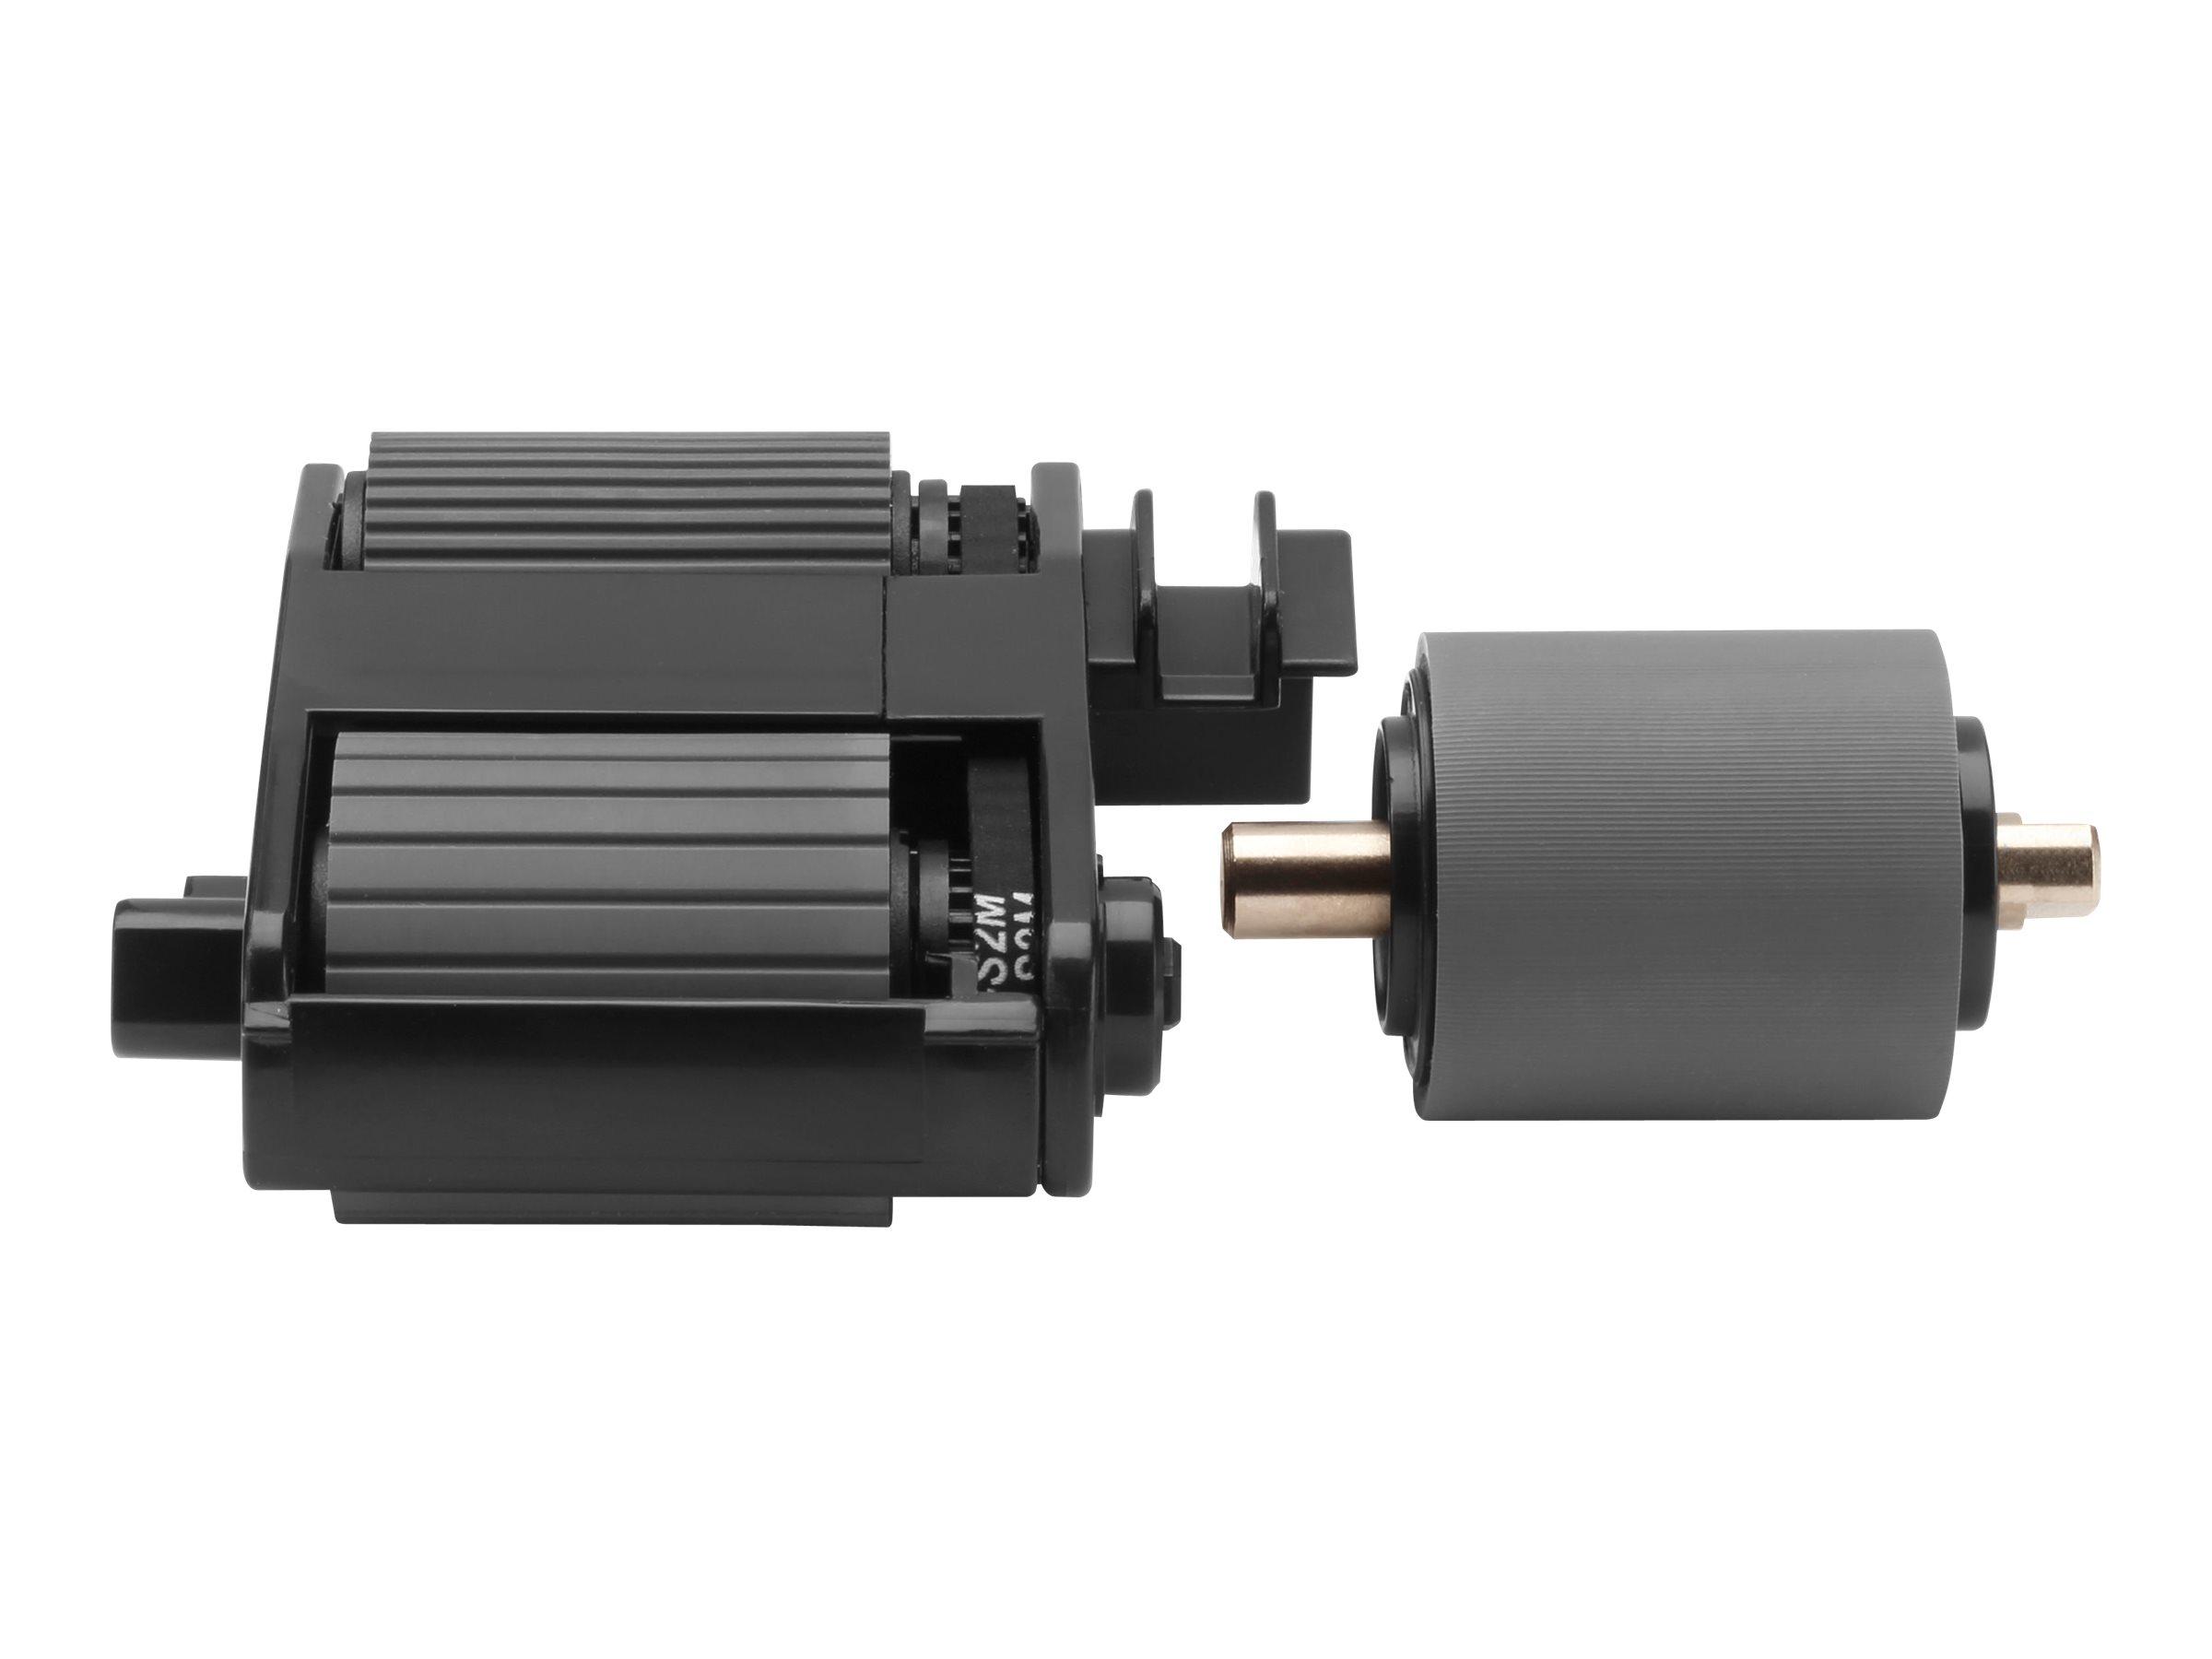 HP Scanjet ADF Separation Pad Kit - Wartungskit - für ScanJet Enterprise Flow N9120 Flatbed Scanner, N9120 Document Flatbed Scan